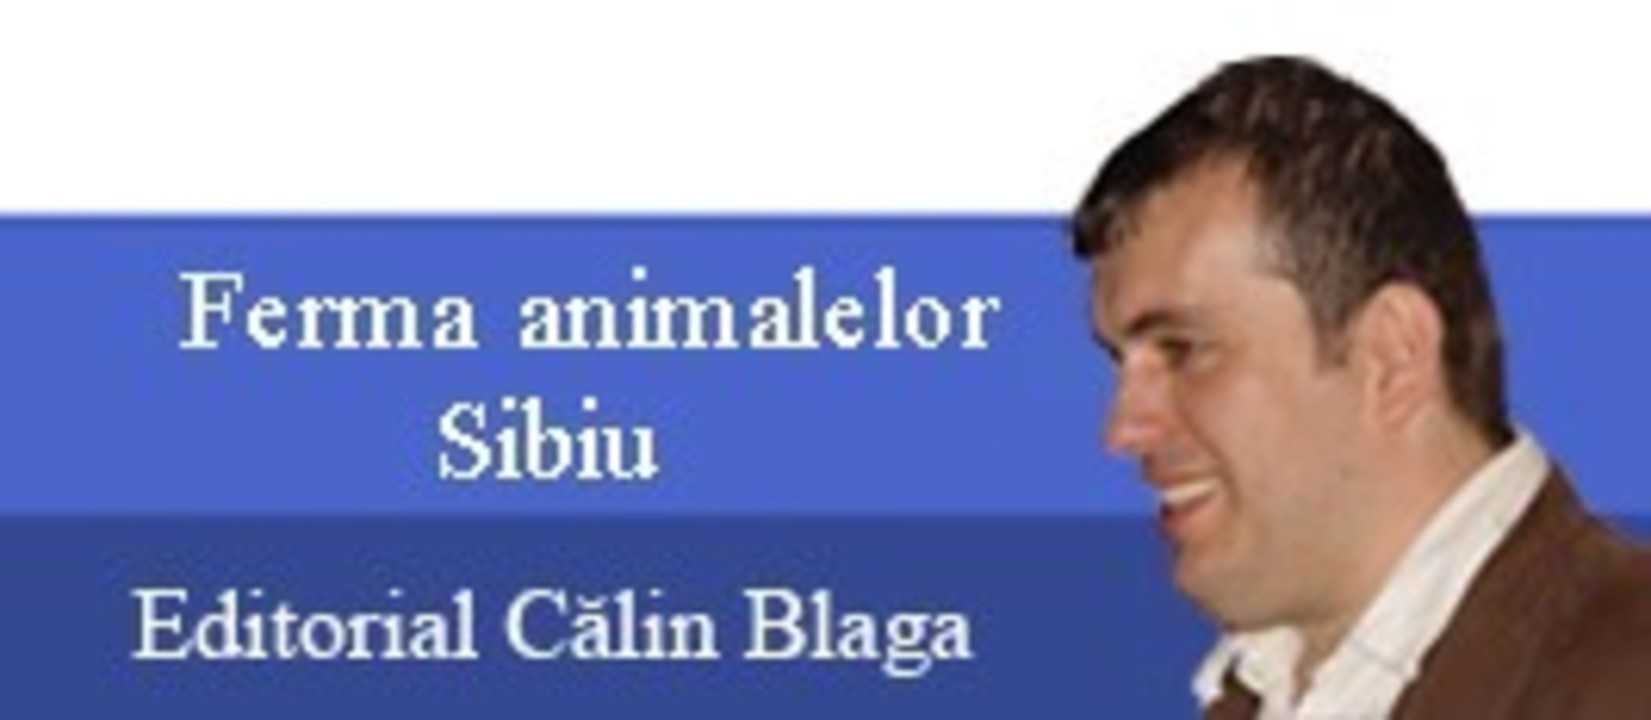 Ferma animalelor Sibiu